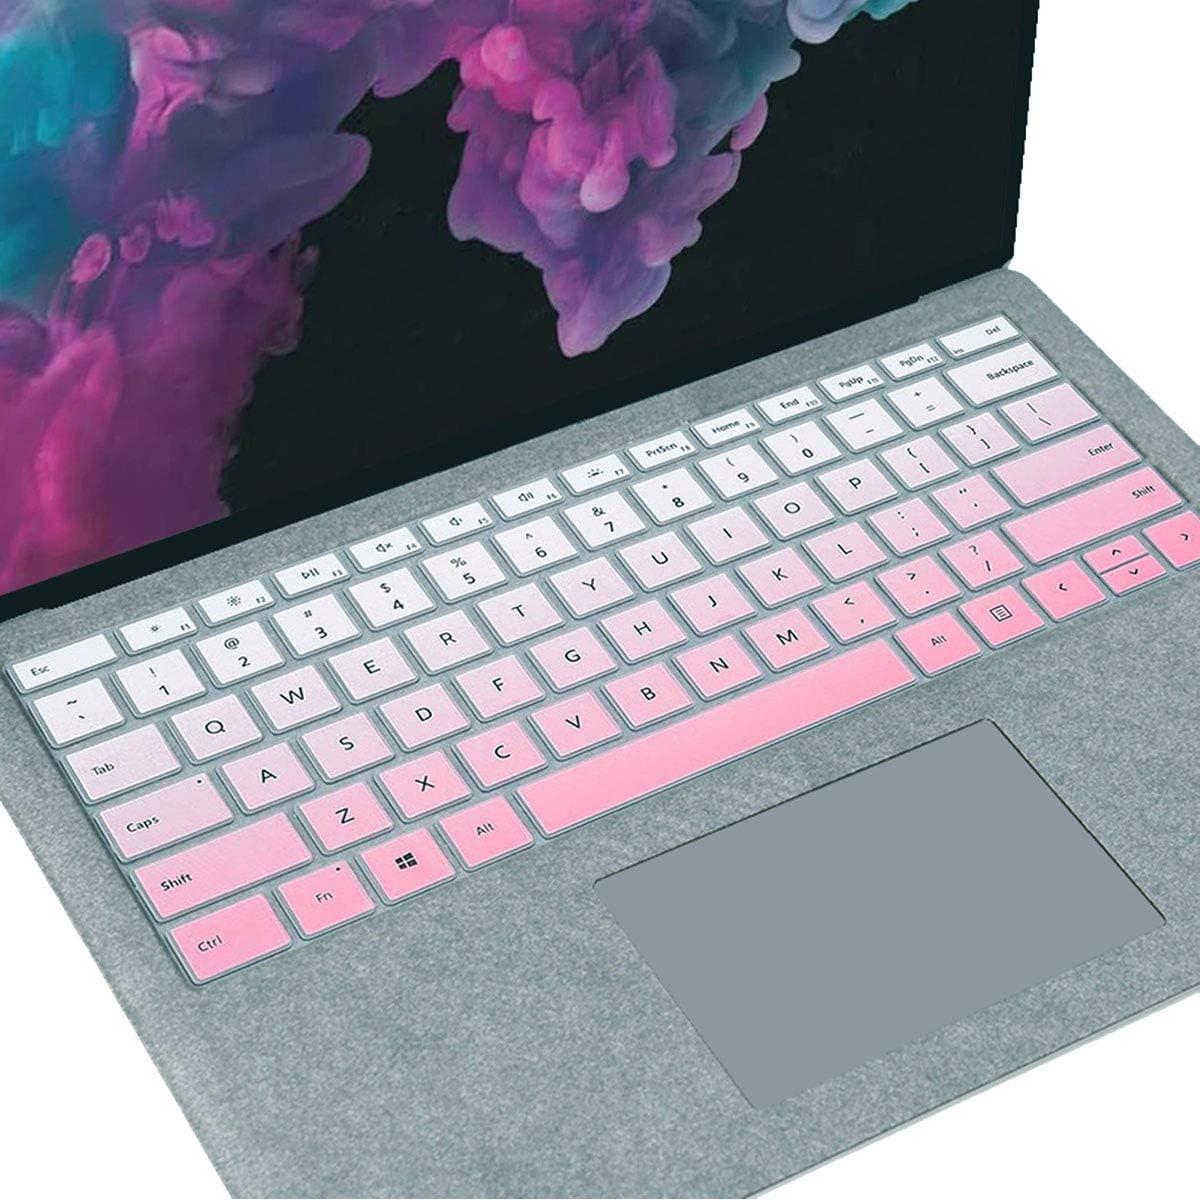 "MUBUY Keyboard Cover Fit 2020 2019 Microsoft Surface Pro 7 |2019 2018 Surface Pro 6 |Surface Pro 5 |Surface Pro 4 12.3"" Premium Ultra Thin Keyboard Protective Skin, US Layout -Gradual Pink"